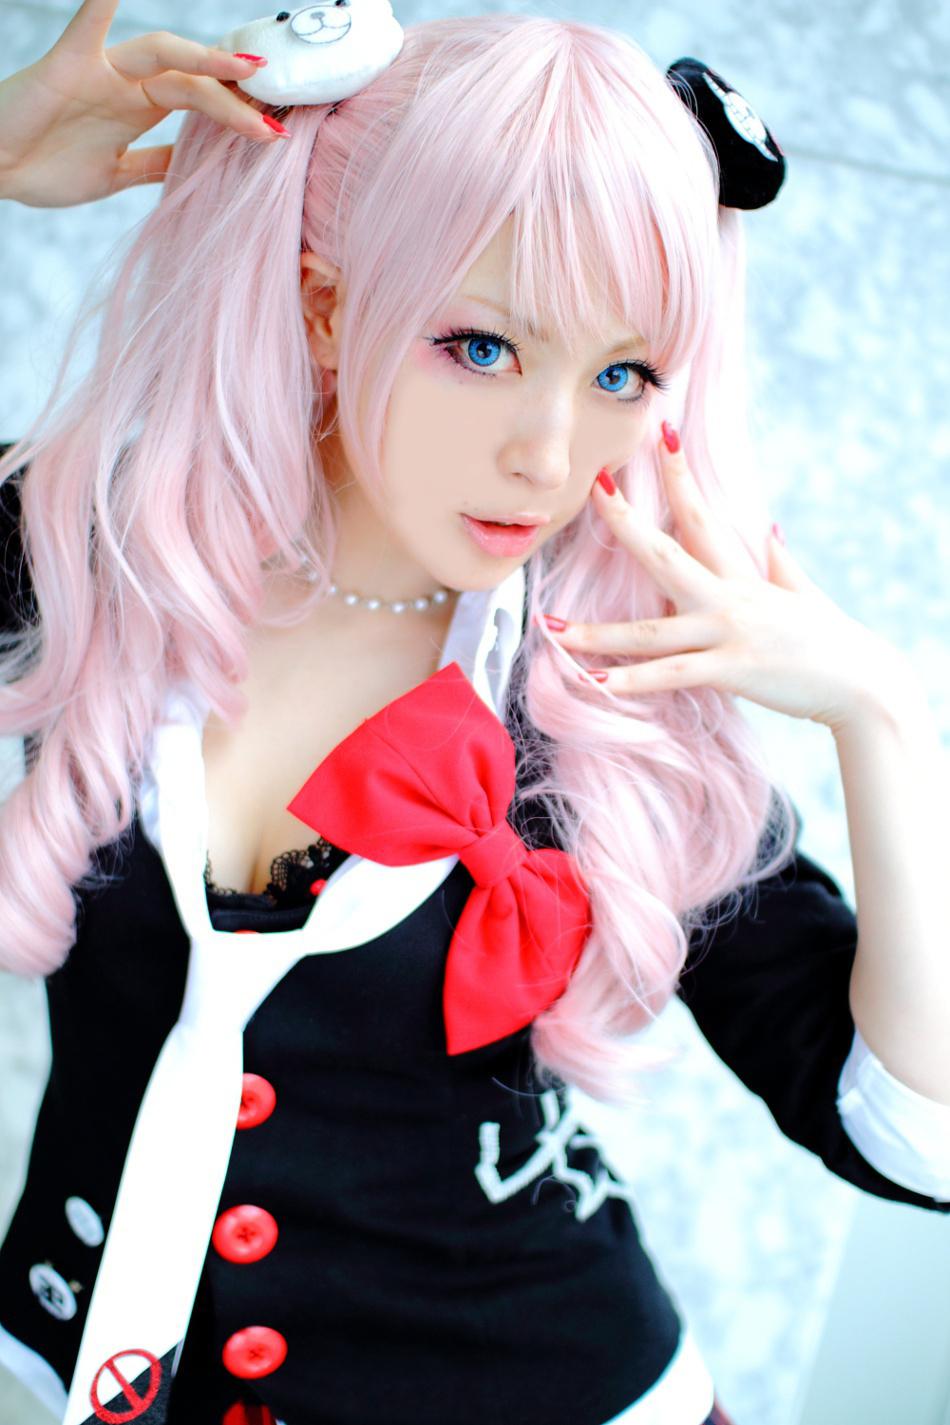 Junko Enoshima | The Cosplay Wiki | FANDOM powered by Wikia